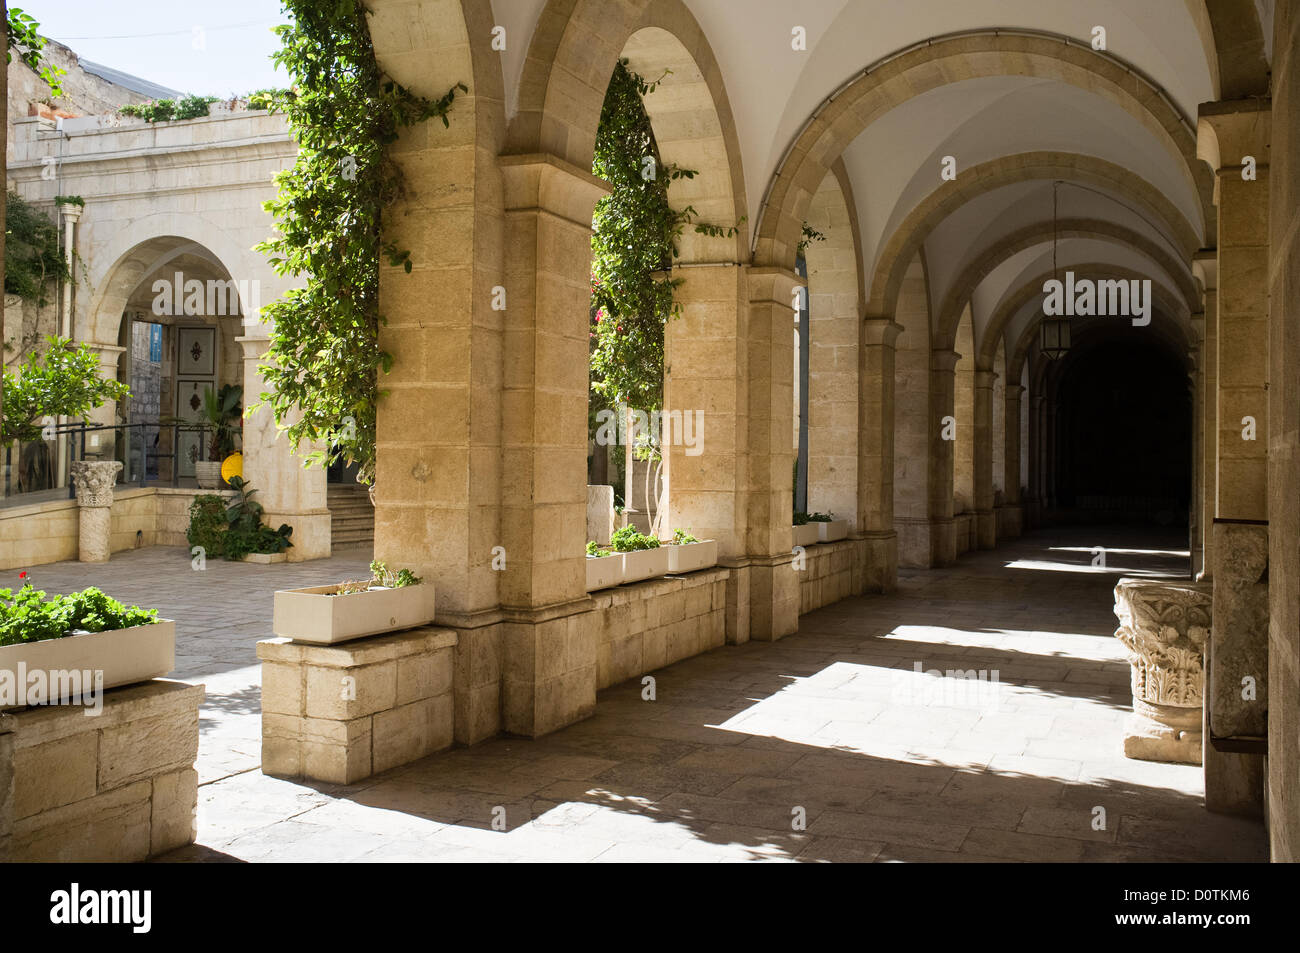 Jerusalem, Israel. 30. November 2012. Geißelung Kloster der Franziskaner-Hof in der zweiten Station der Via Stockbild